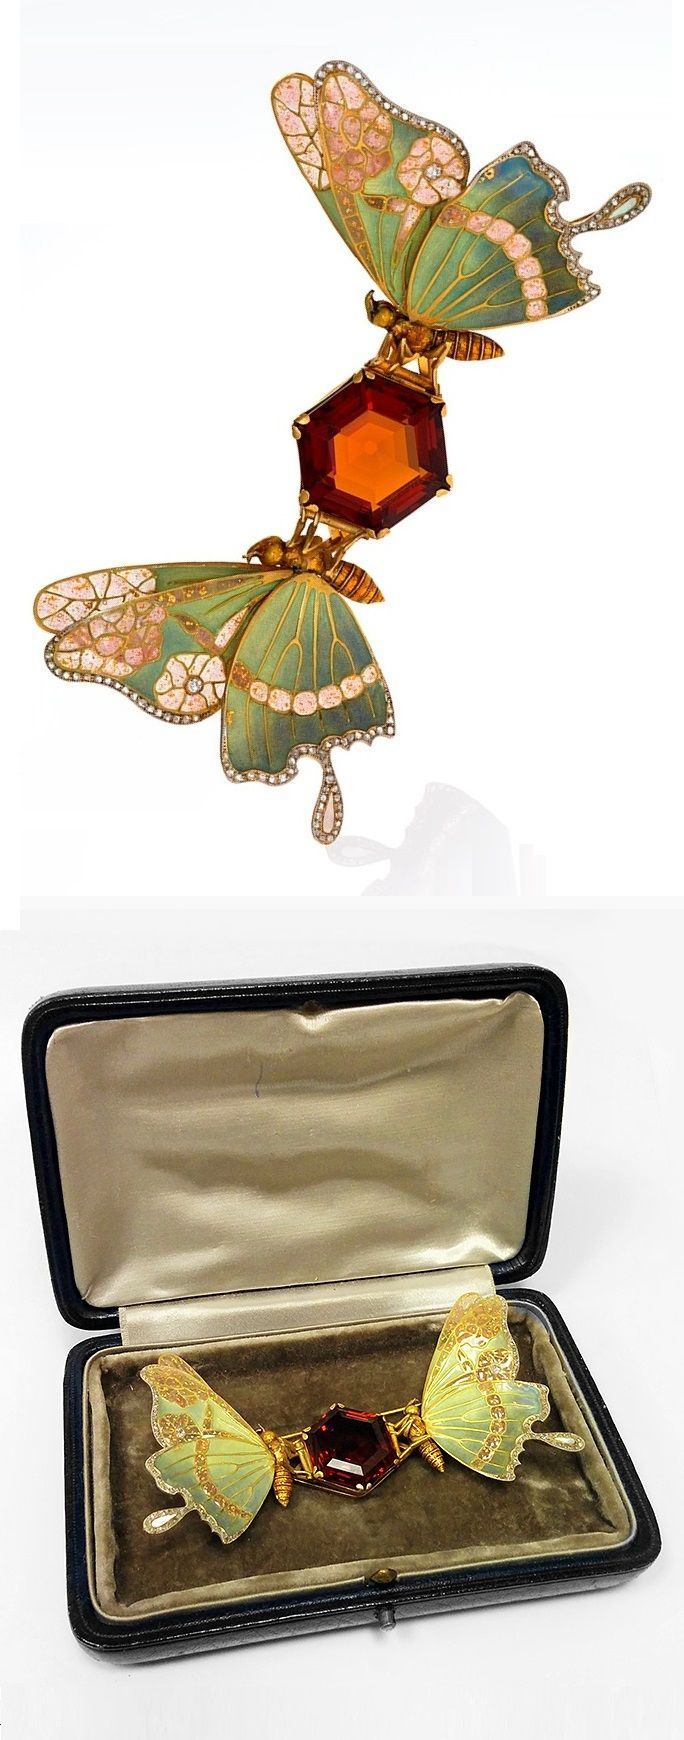 An exceptional Art Nouveau topaz, diamond and enamel butterfly brooch, circa 1900. 4 1/4 x 2 1/2 inches. #ArtNouveau #brooch